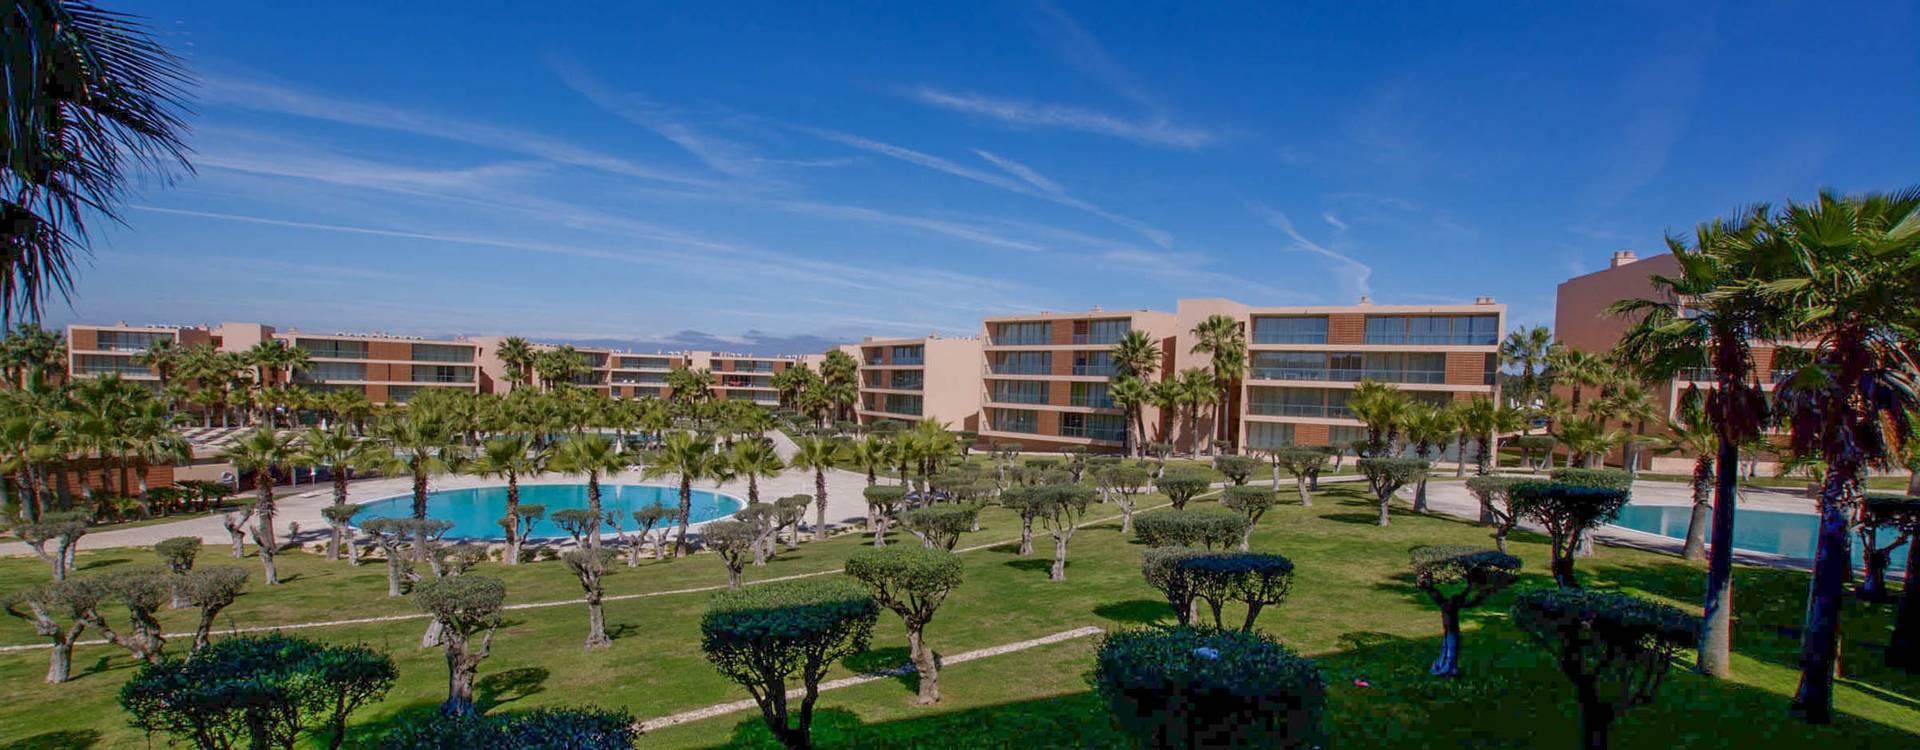 Luxury apartments - Salgados